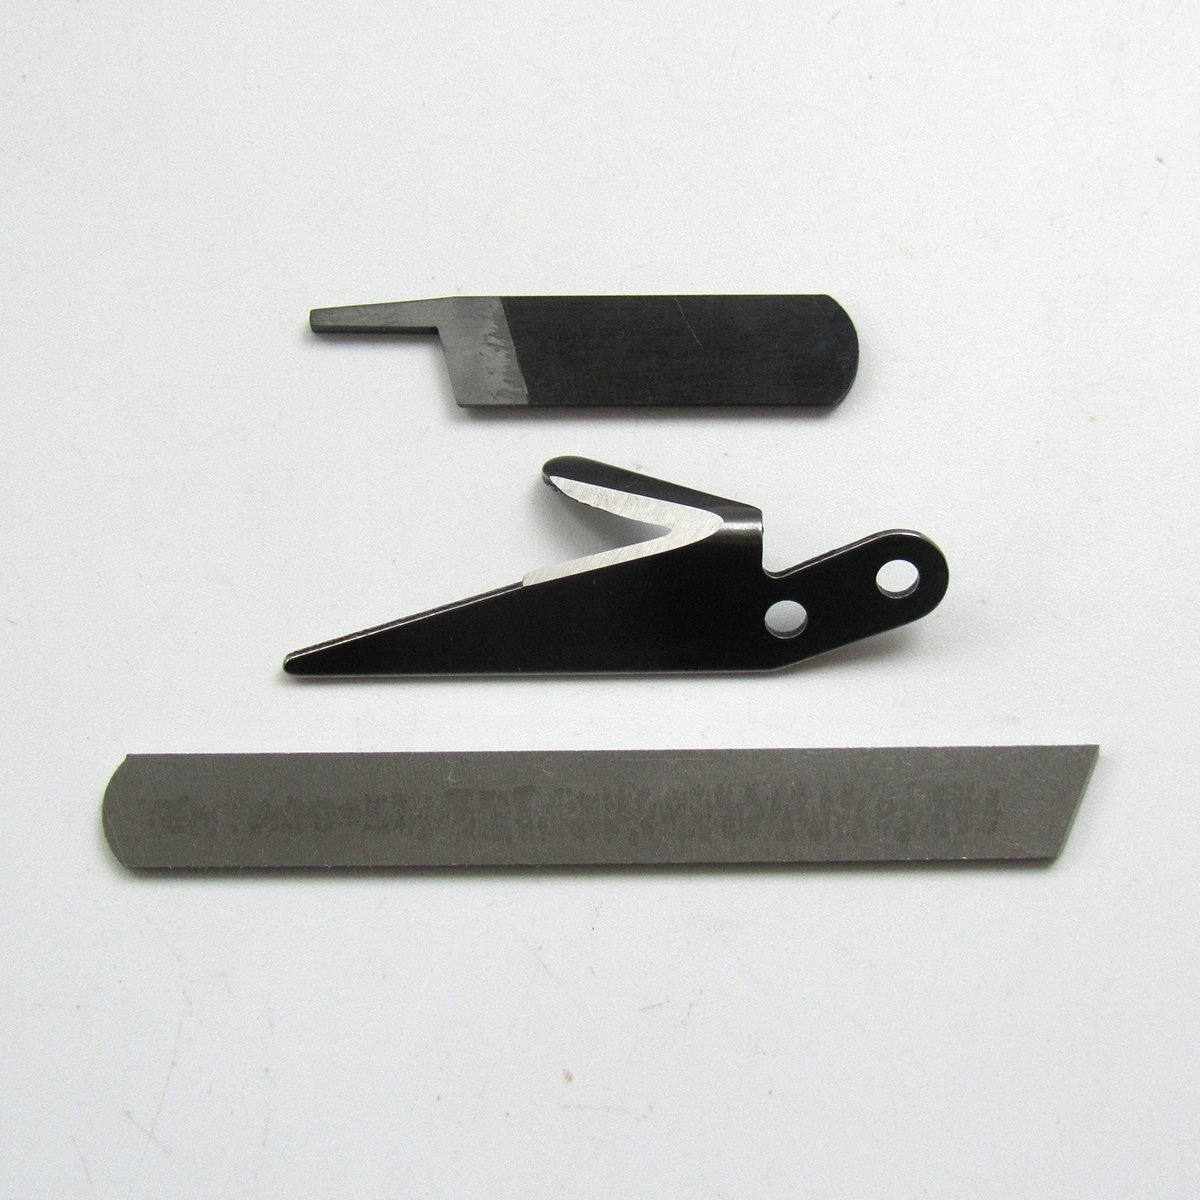 KUNPENG - # 32914 + 30421 + 32706 1conjunto KNIFE SET 3 OVERLOCK KNIVES - para YAMATO DCZ-361: Amazon.es: Hogar